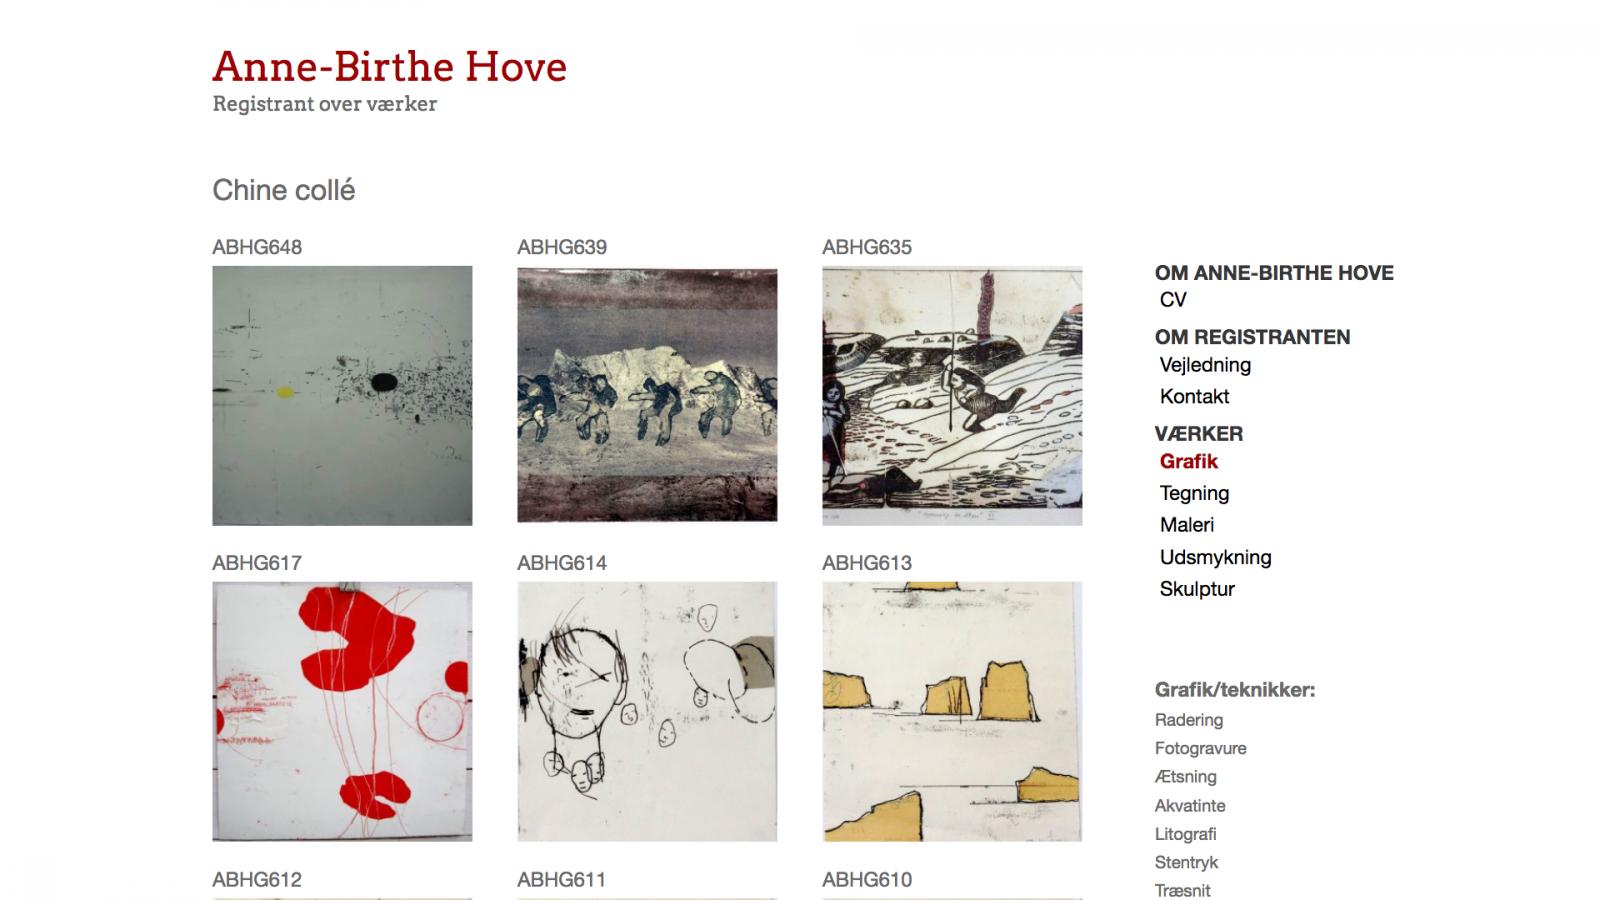 annebirthehove.com - desktop version.